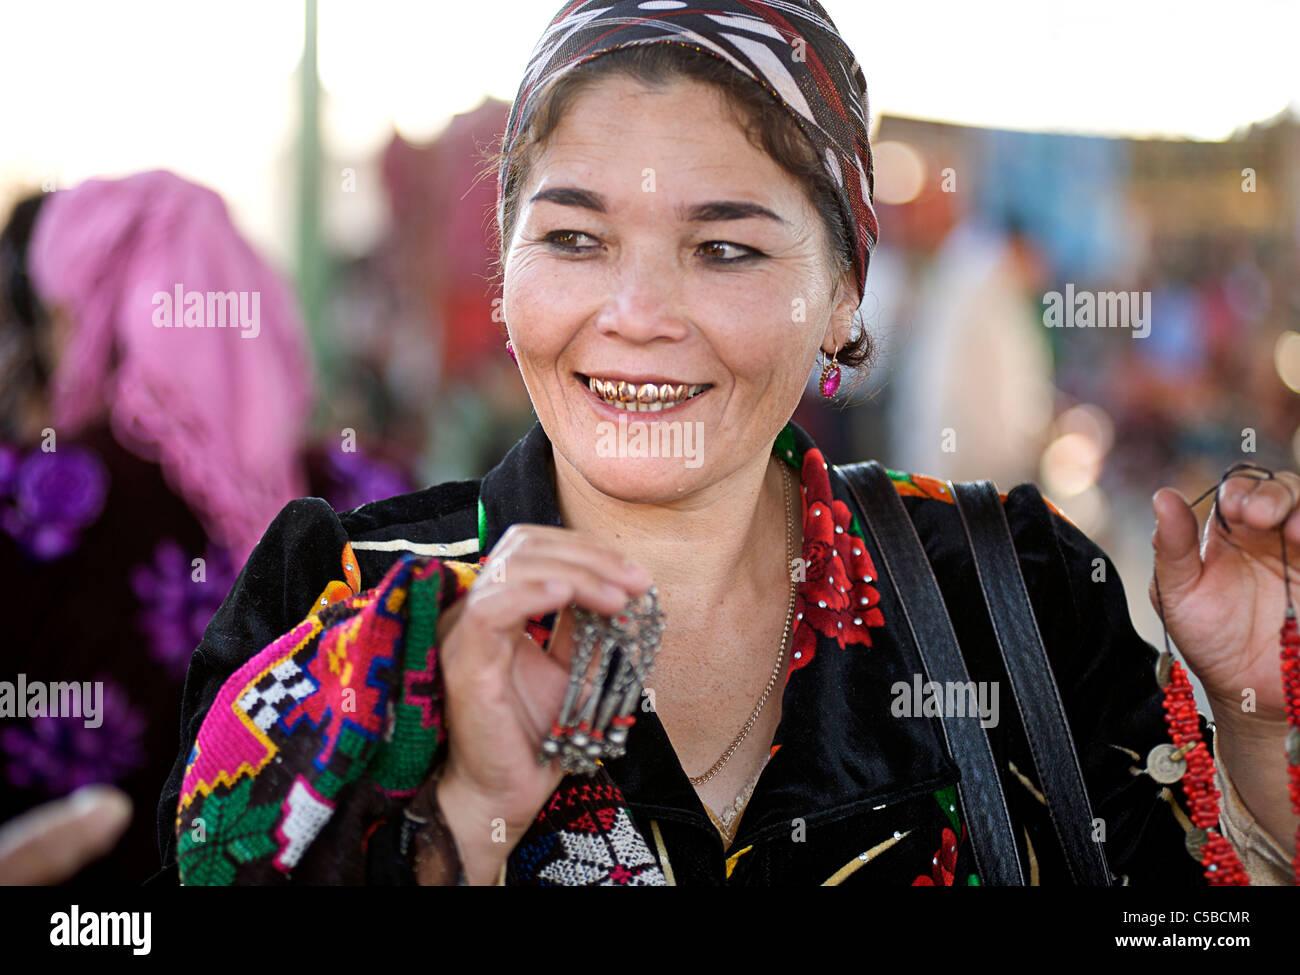 Textile vendor, Urgut market, Samarkand, Uzbekistan - Stock Image